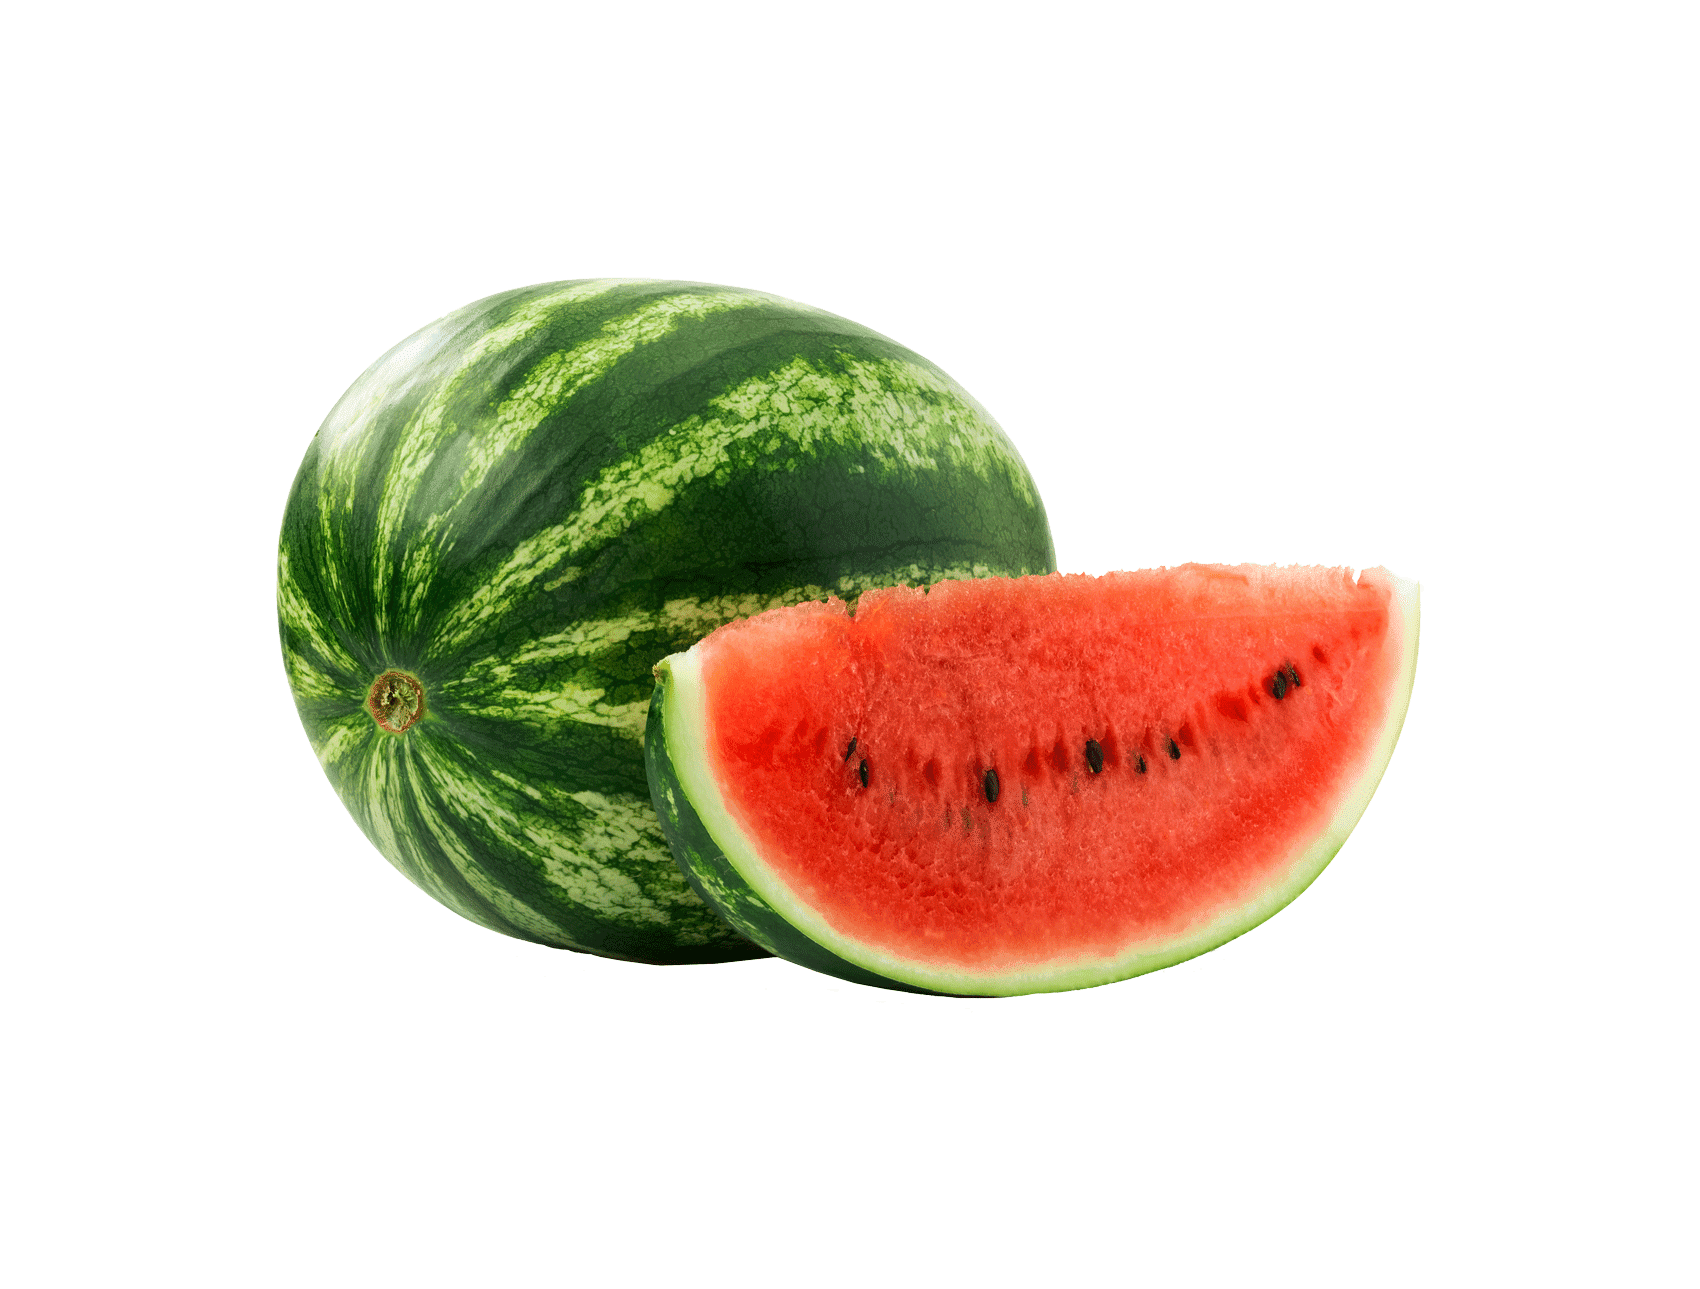 Watermelon - Арбуз